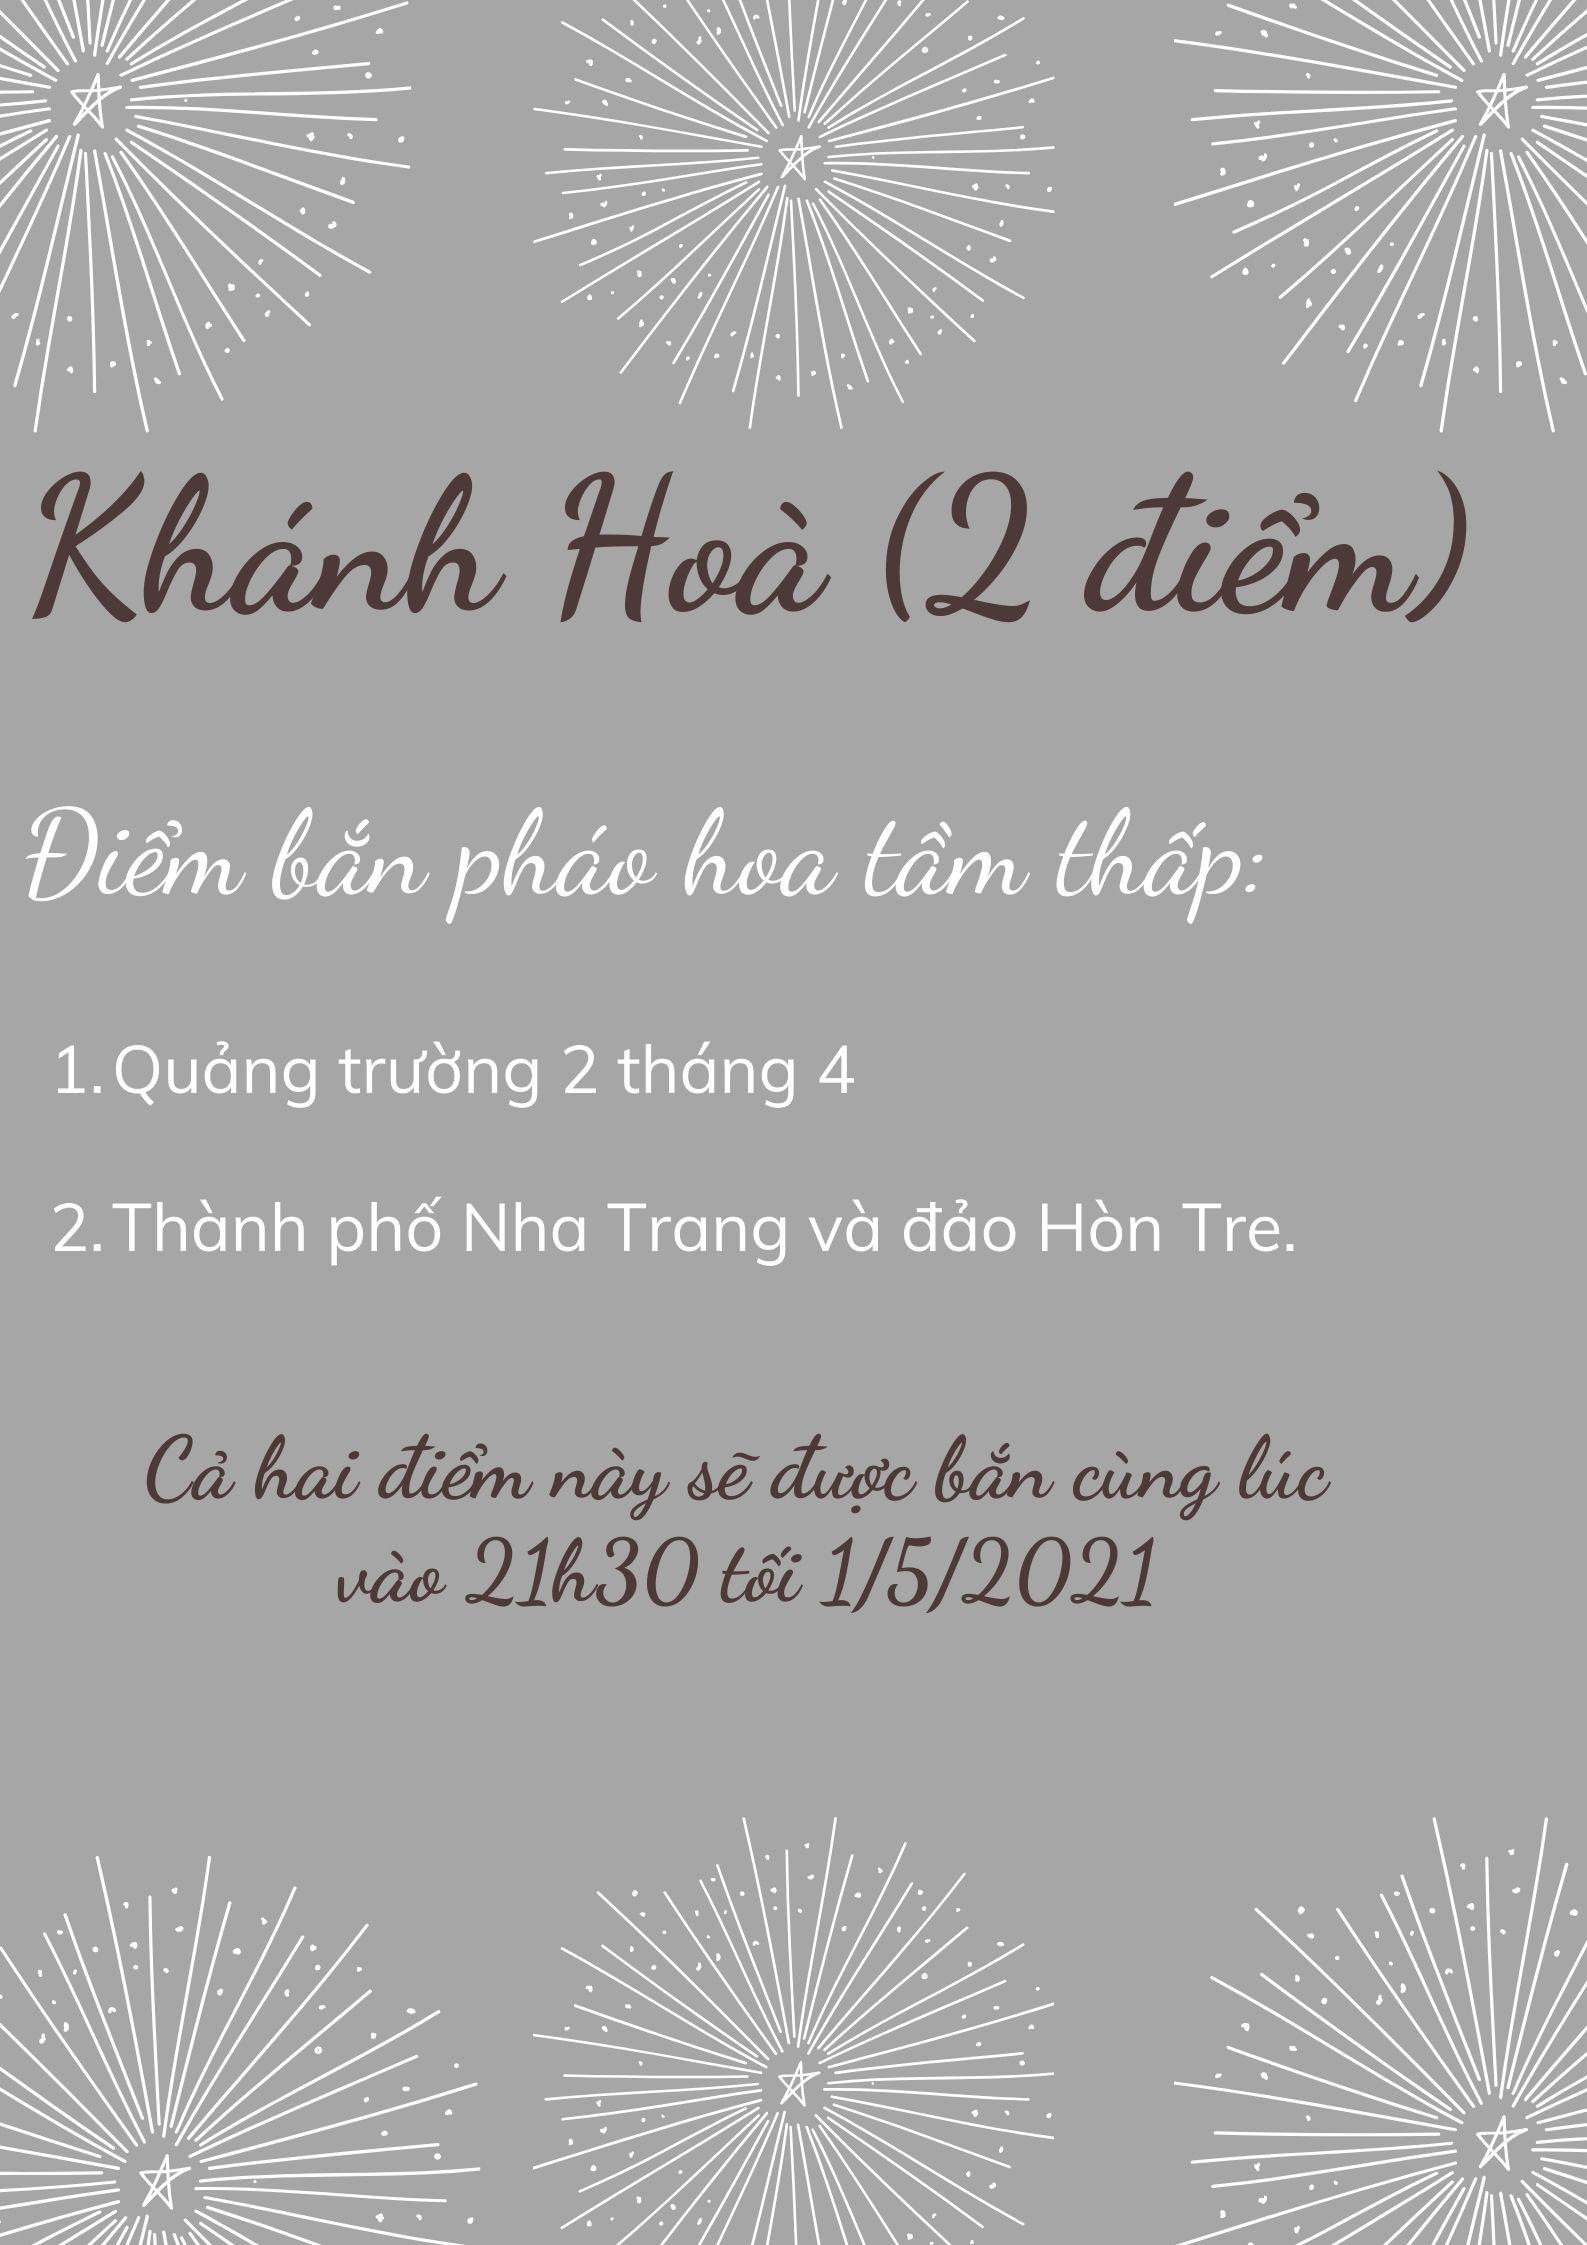 dia-diem-ban-phao-hoa-30/4